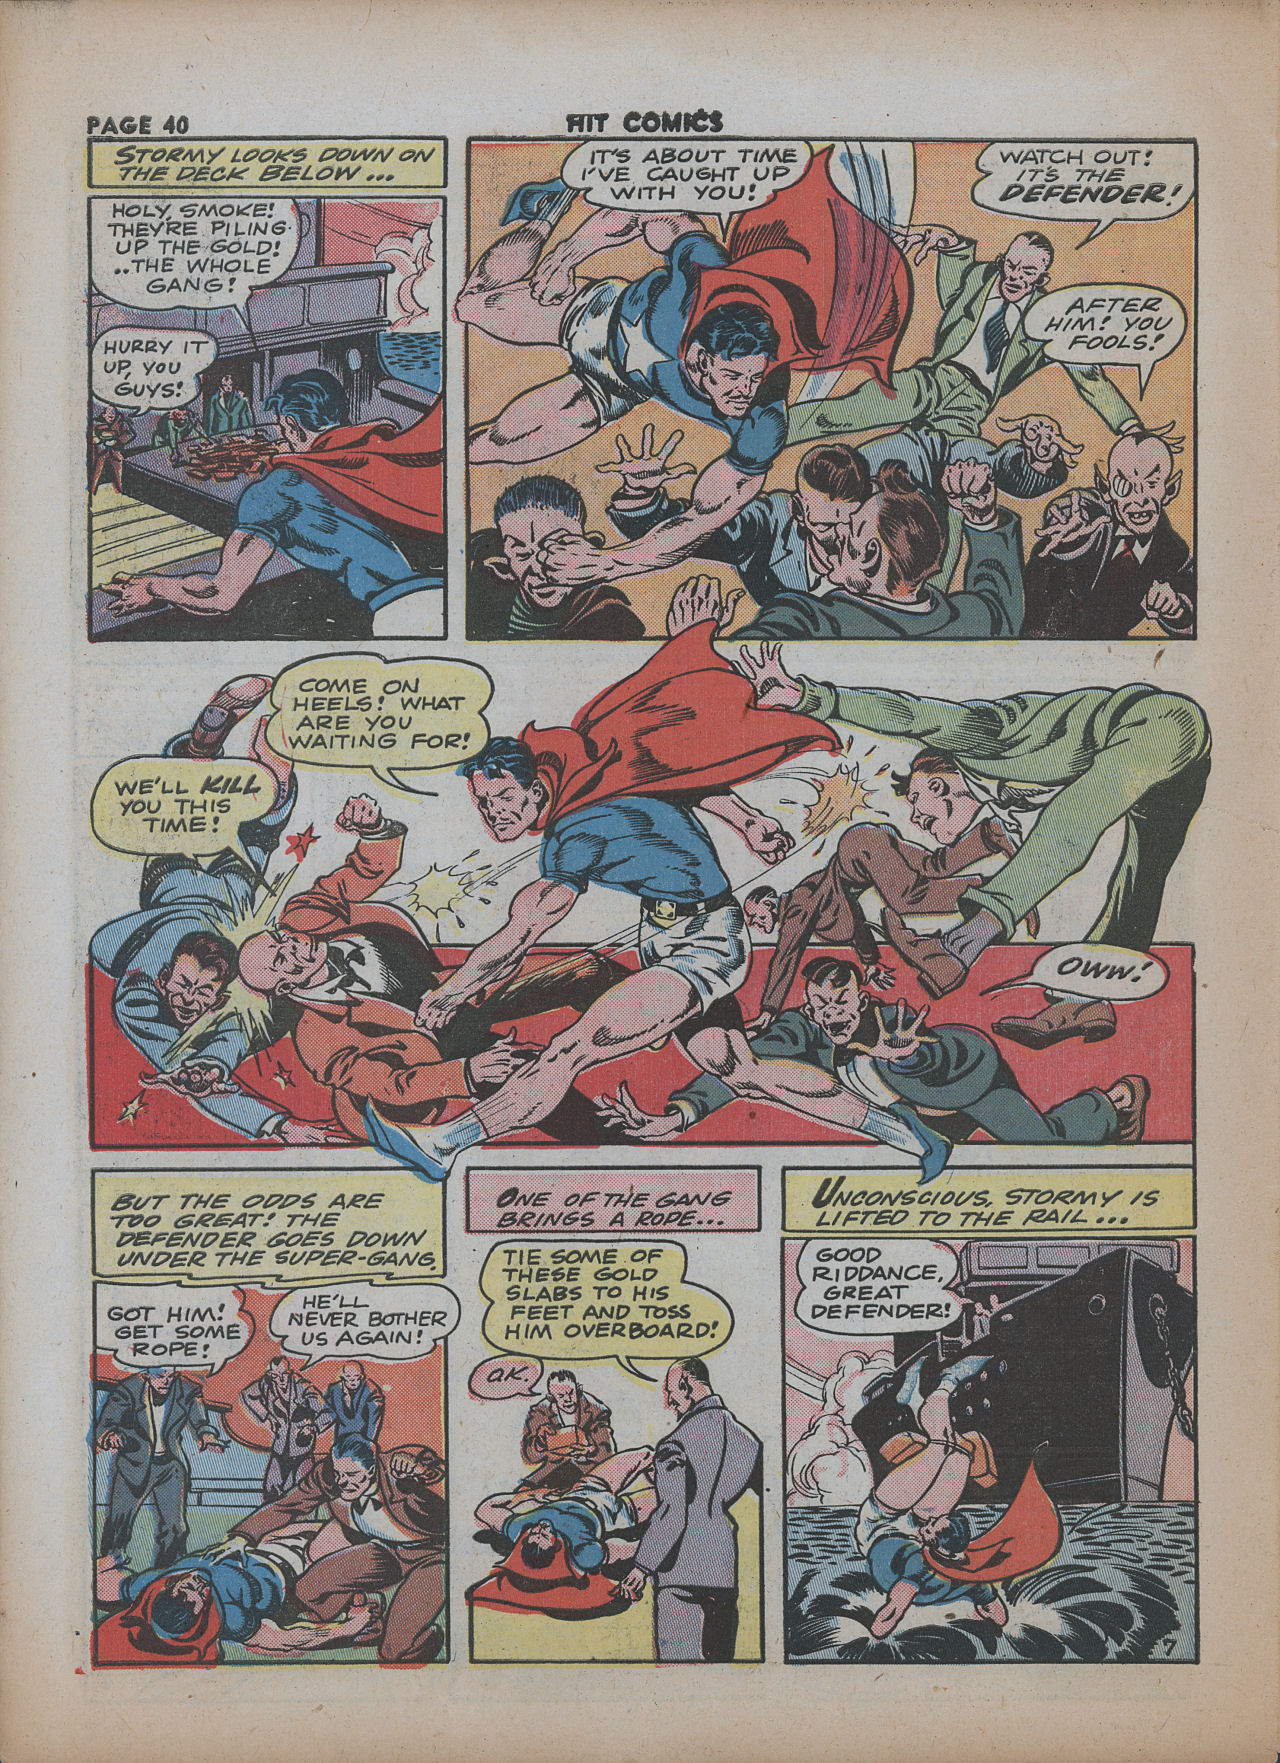 Read online Hit Comics comic -  Issue #26 - 41